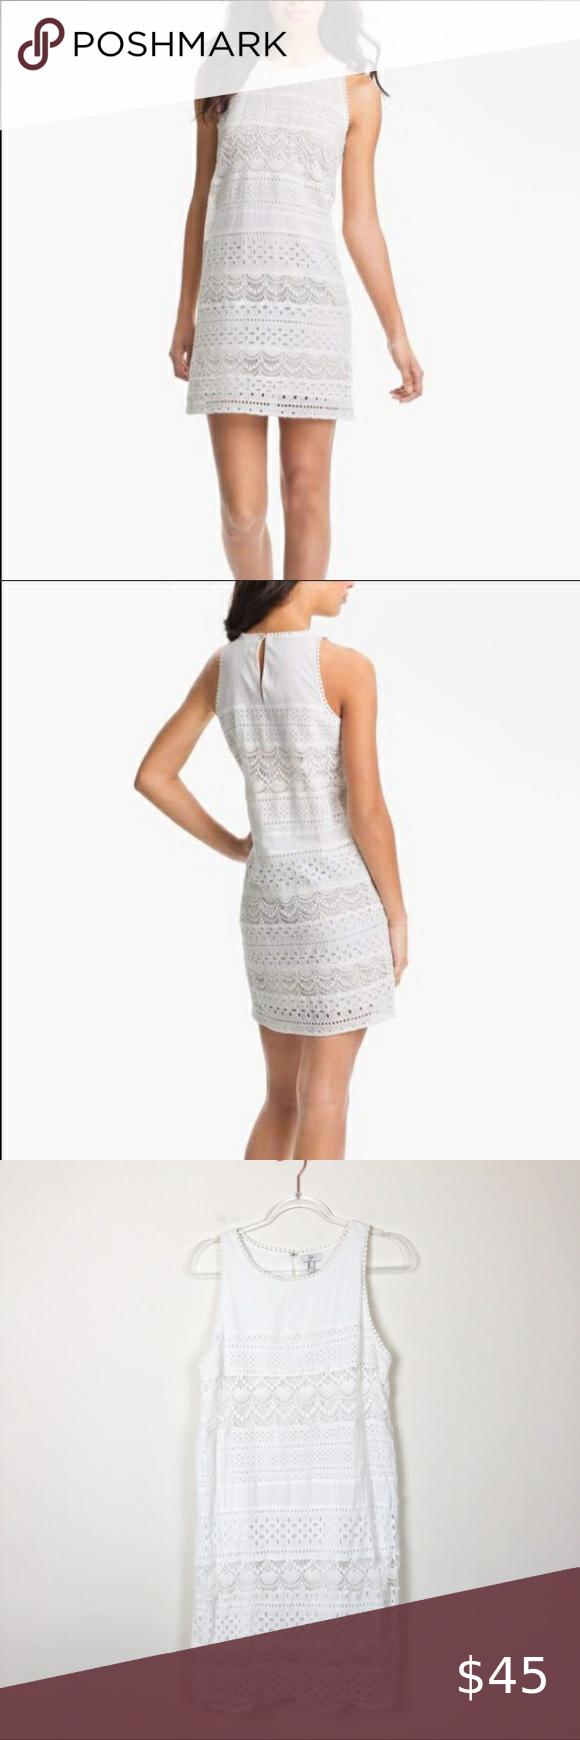 Joie Behati White Eyelet Shift Dress Size M Medium Shift Dress Dresses White Eyelet [ 1740 x 580 Pixel ]